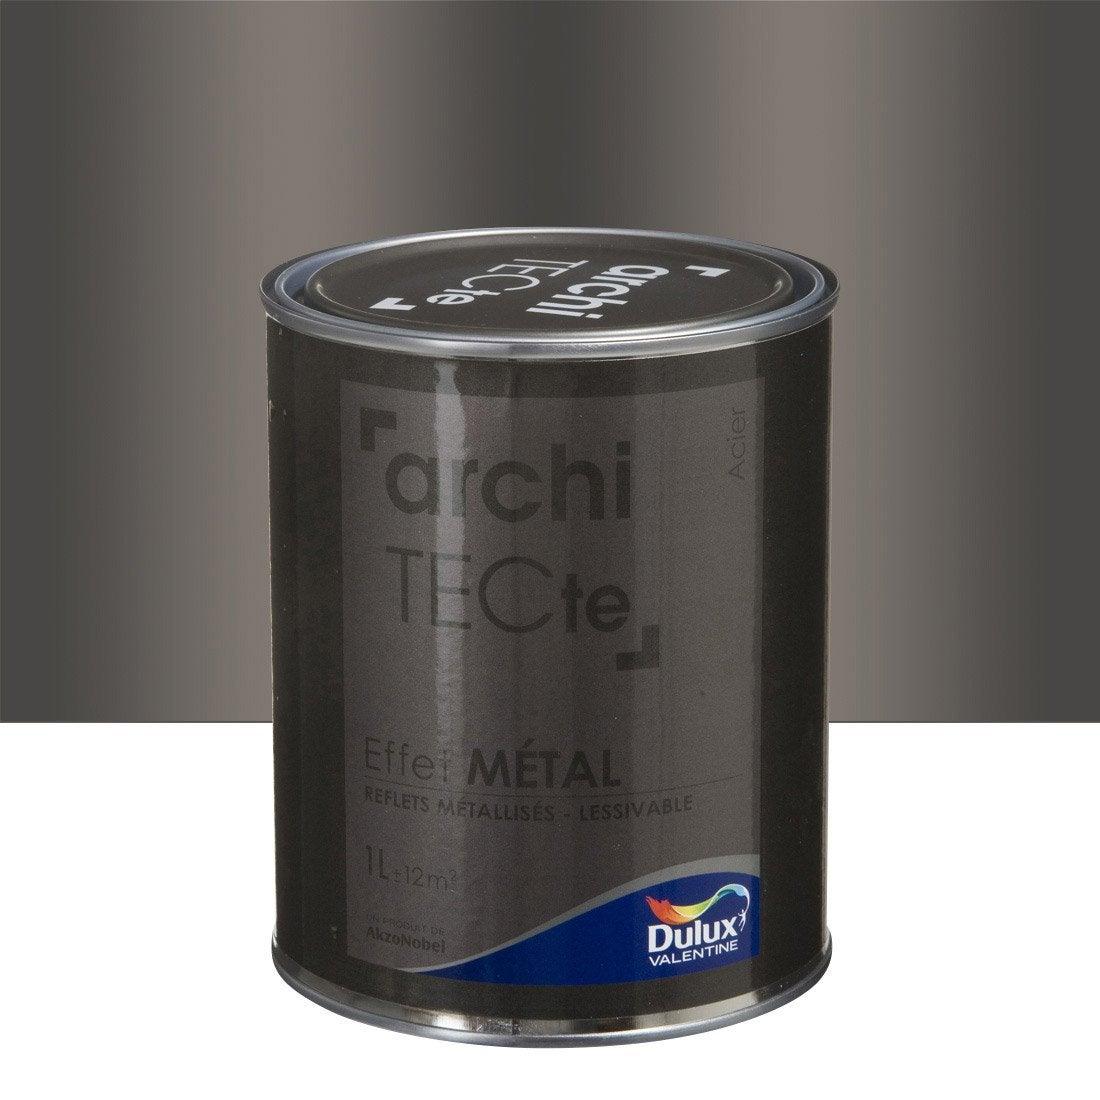 Peinture effet architecte effet m tal dulux valentine gris acier 1 l l - Peinture effet aluminium ...